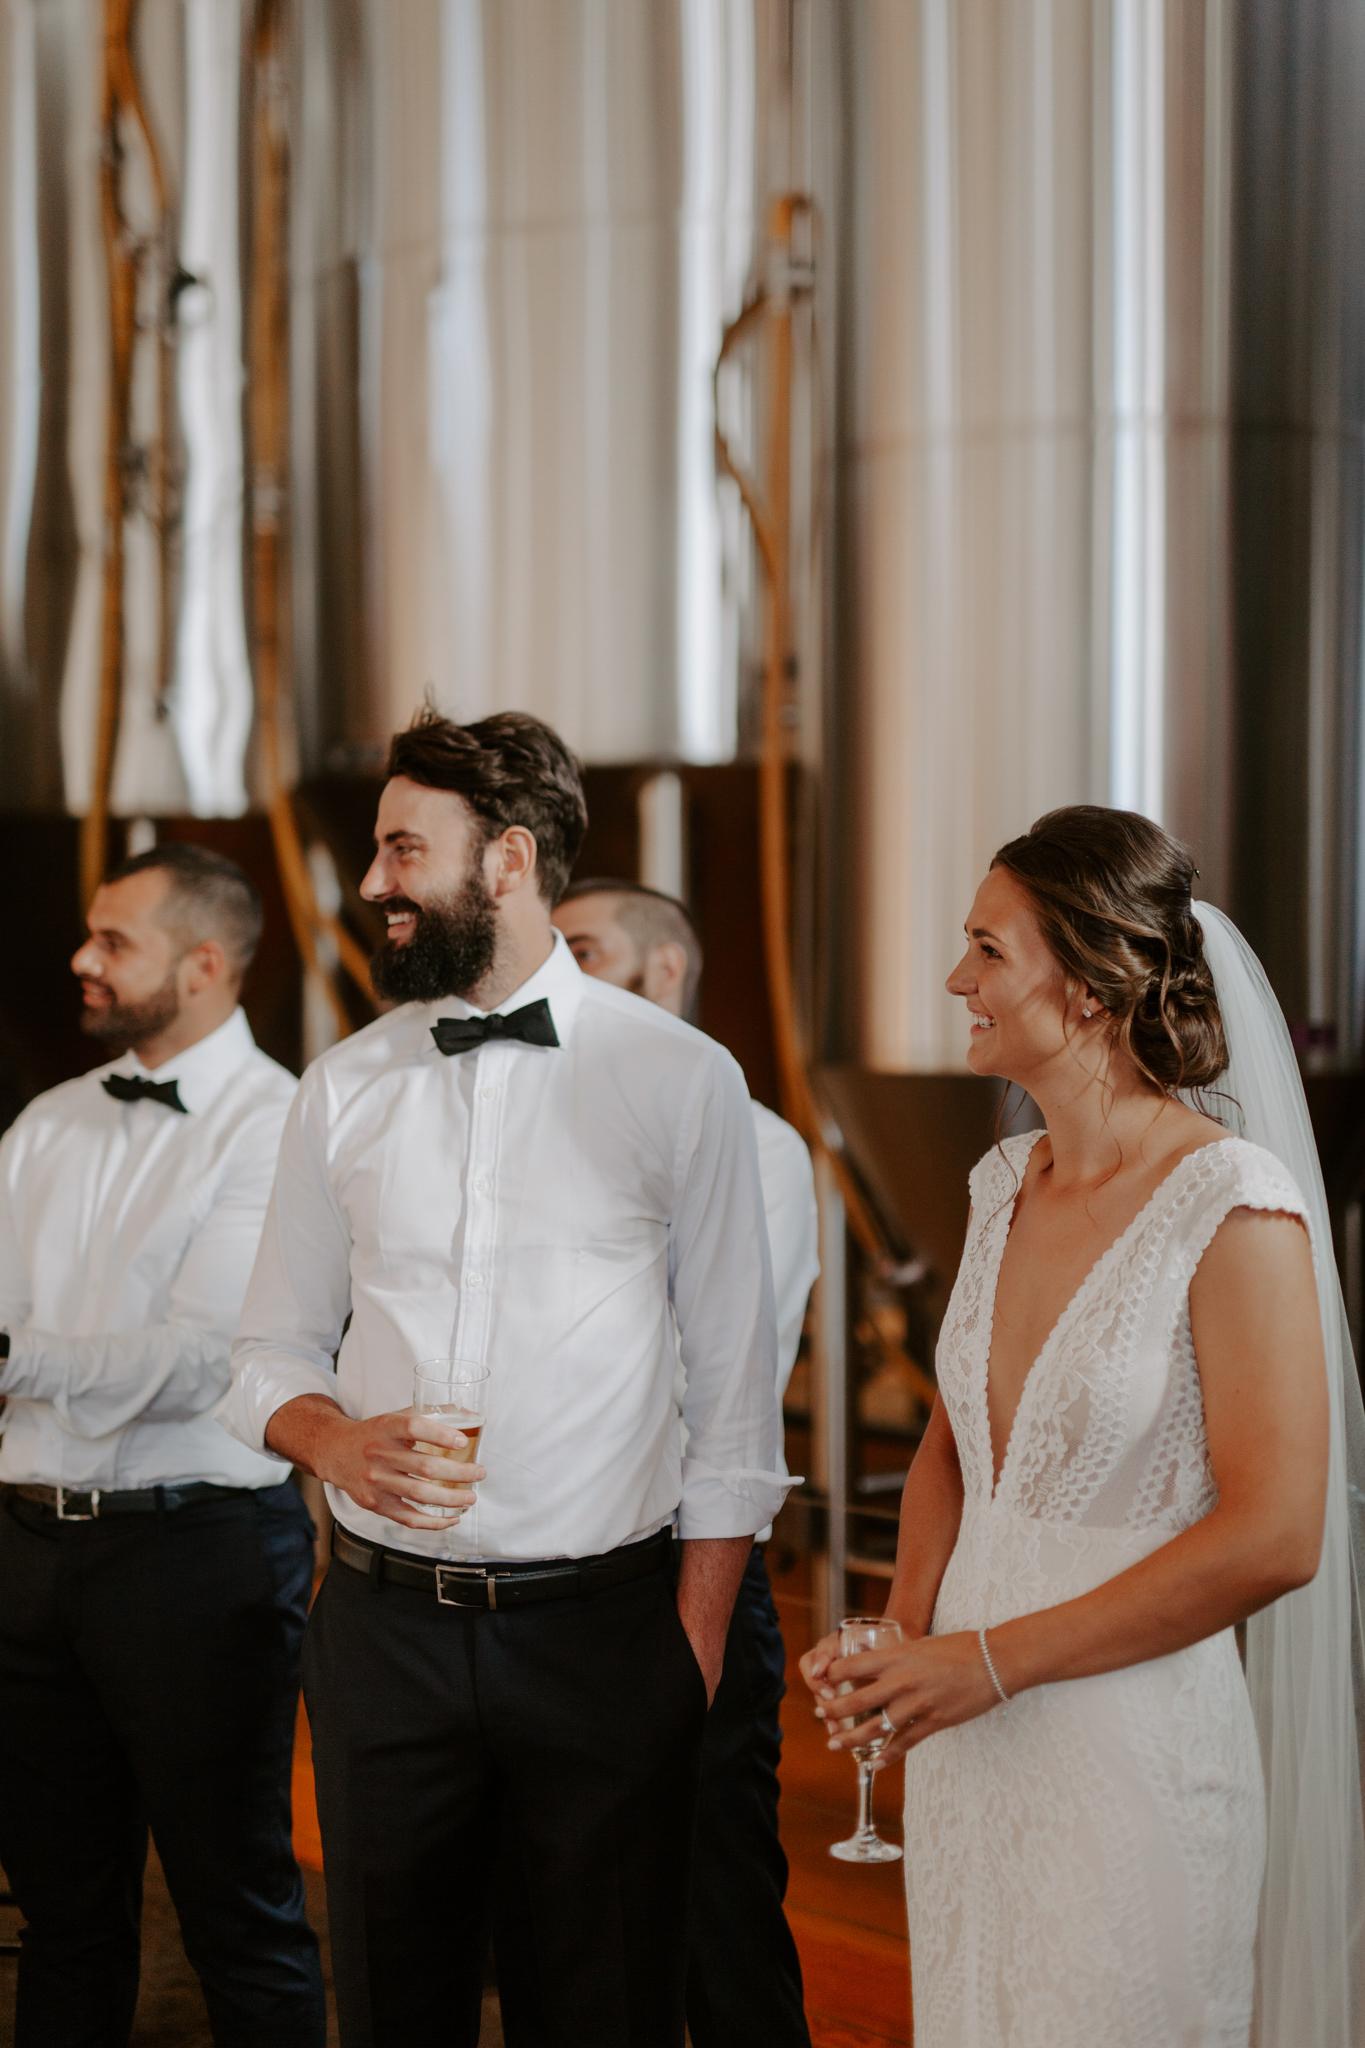 Mountain-Goat-Brewery-wedding-095.jpg